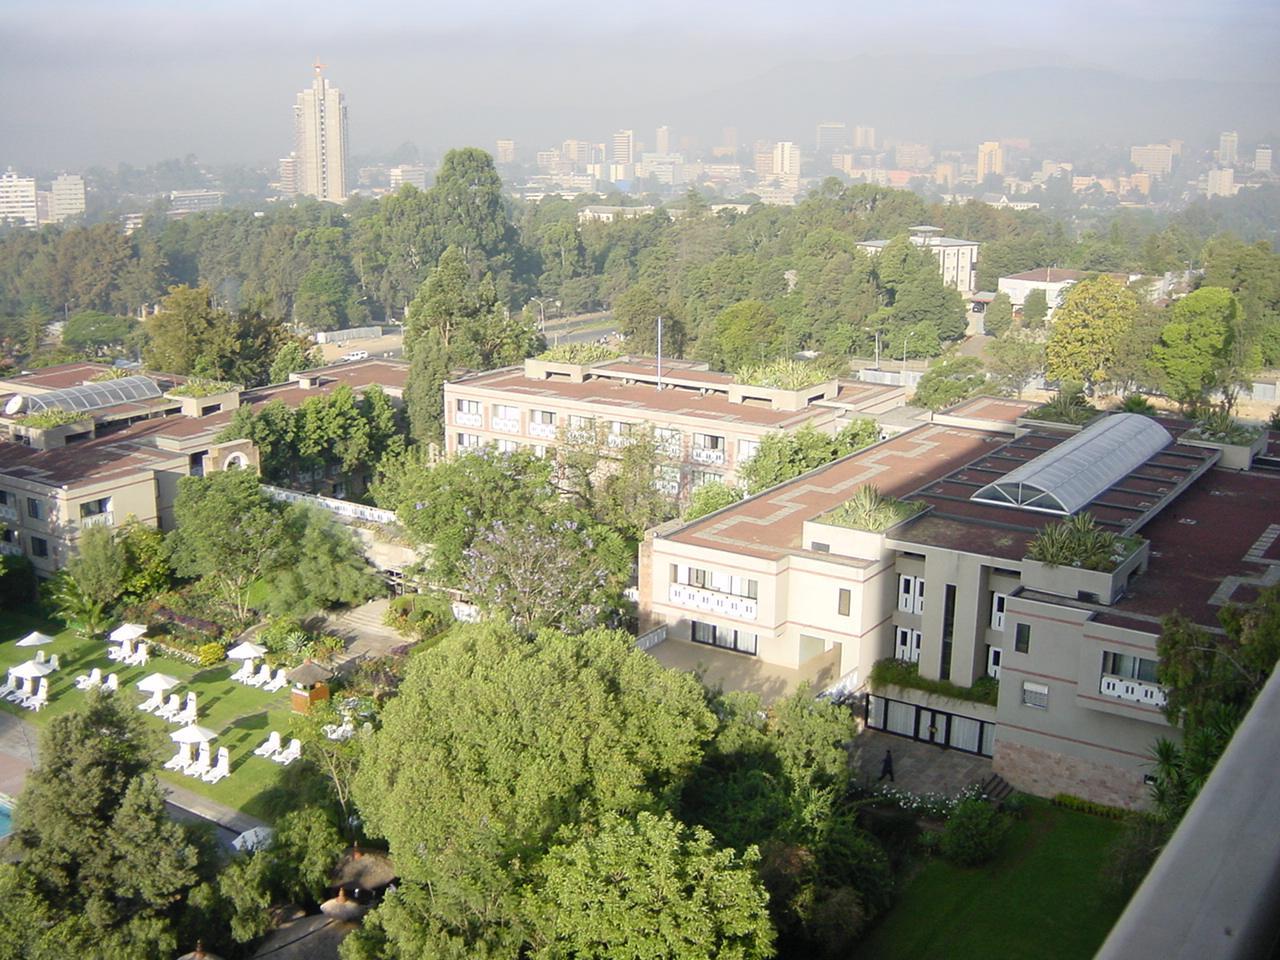 Addis Ababa Ethiopia  city photo : Addis Ababa Ethiopia | DiyMid.com